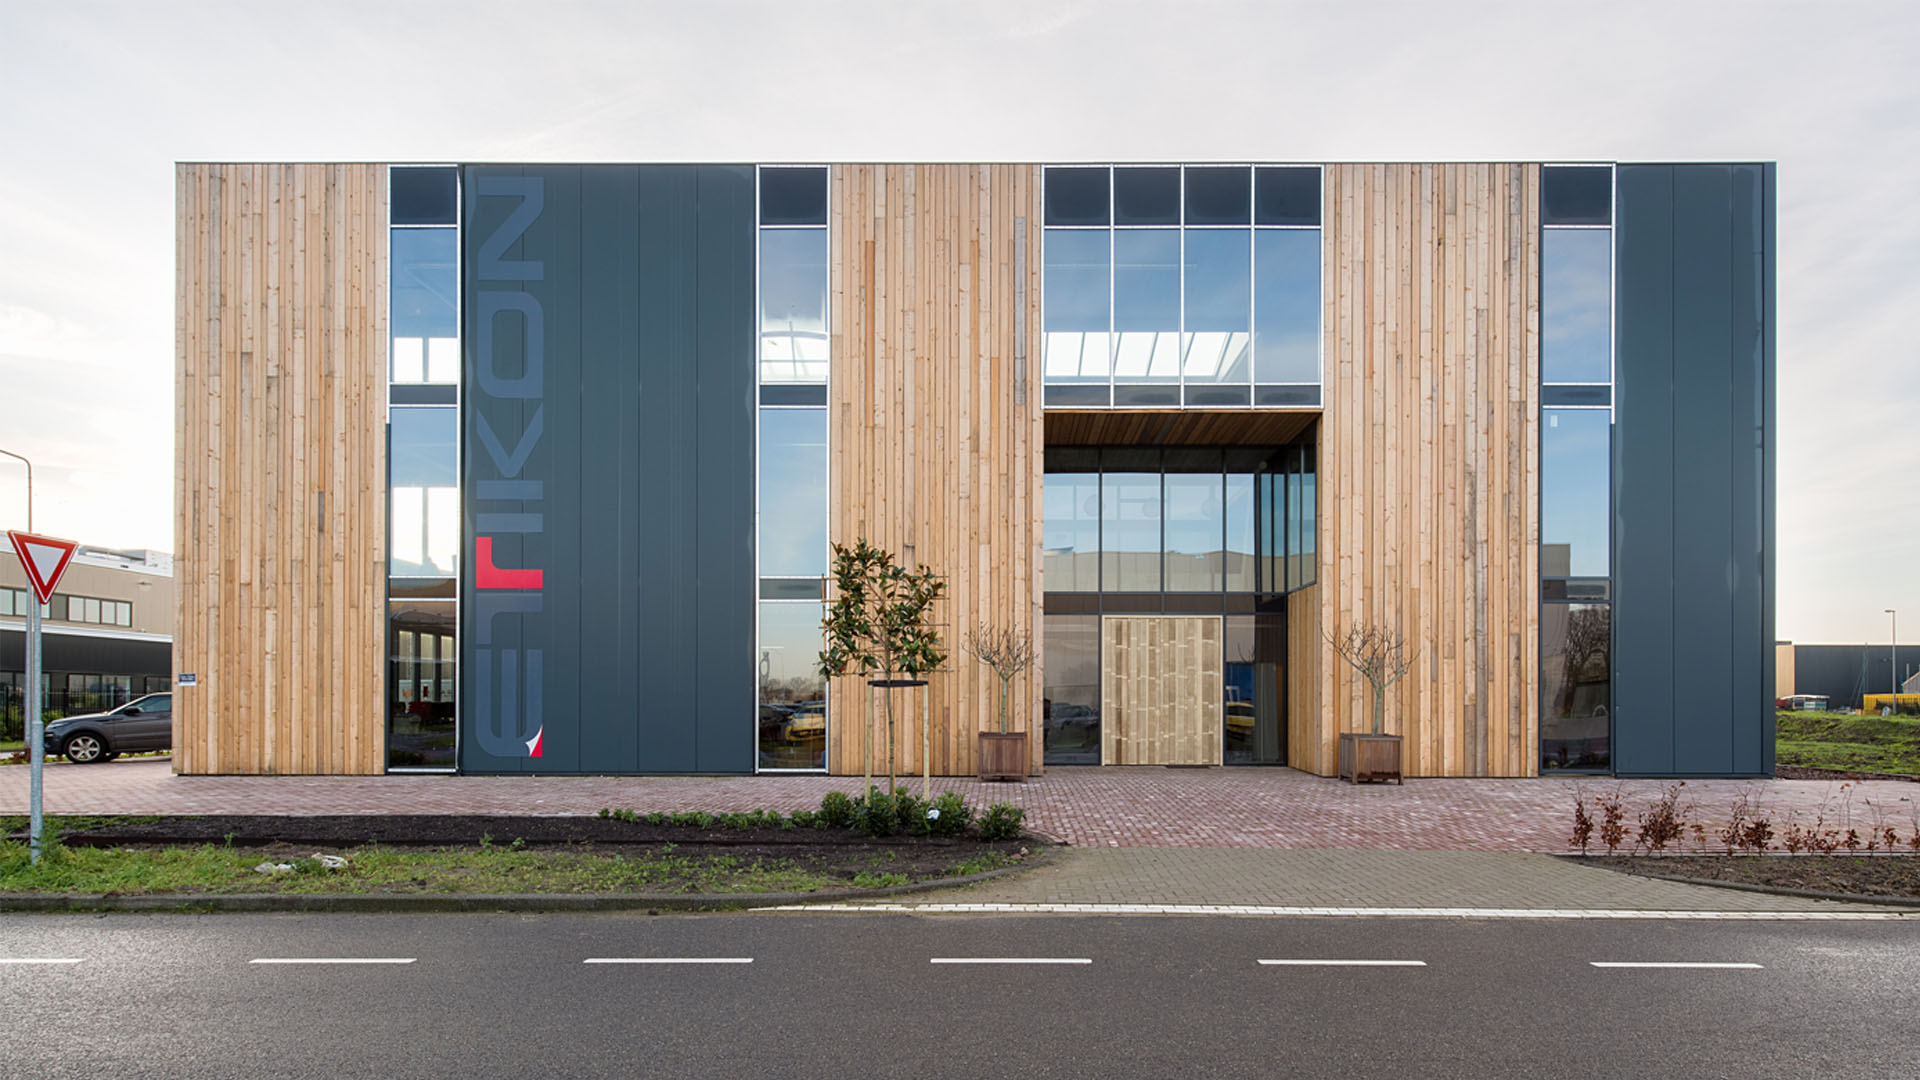 Nieuwbouw bedrijfspand Etikon | Wijnja Groep Bouw & Interieur